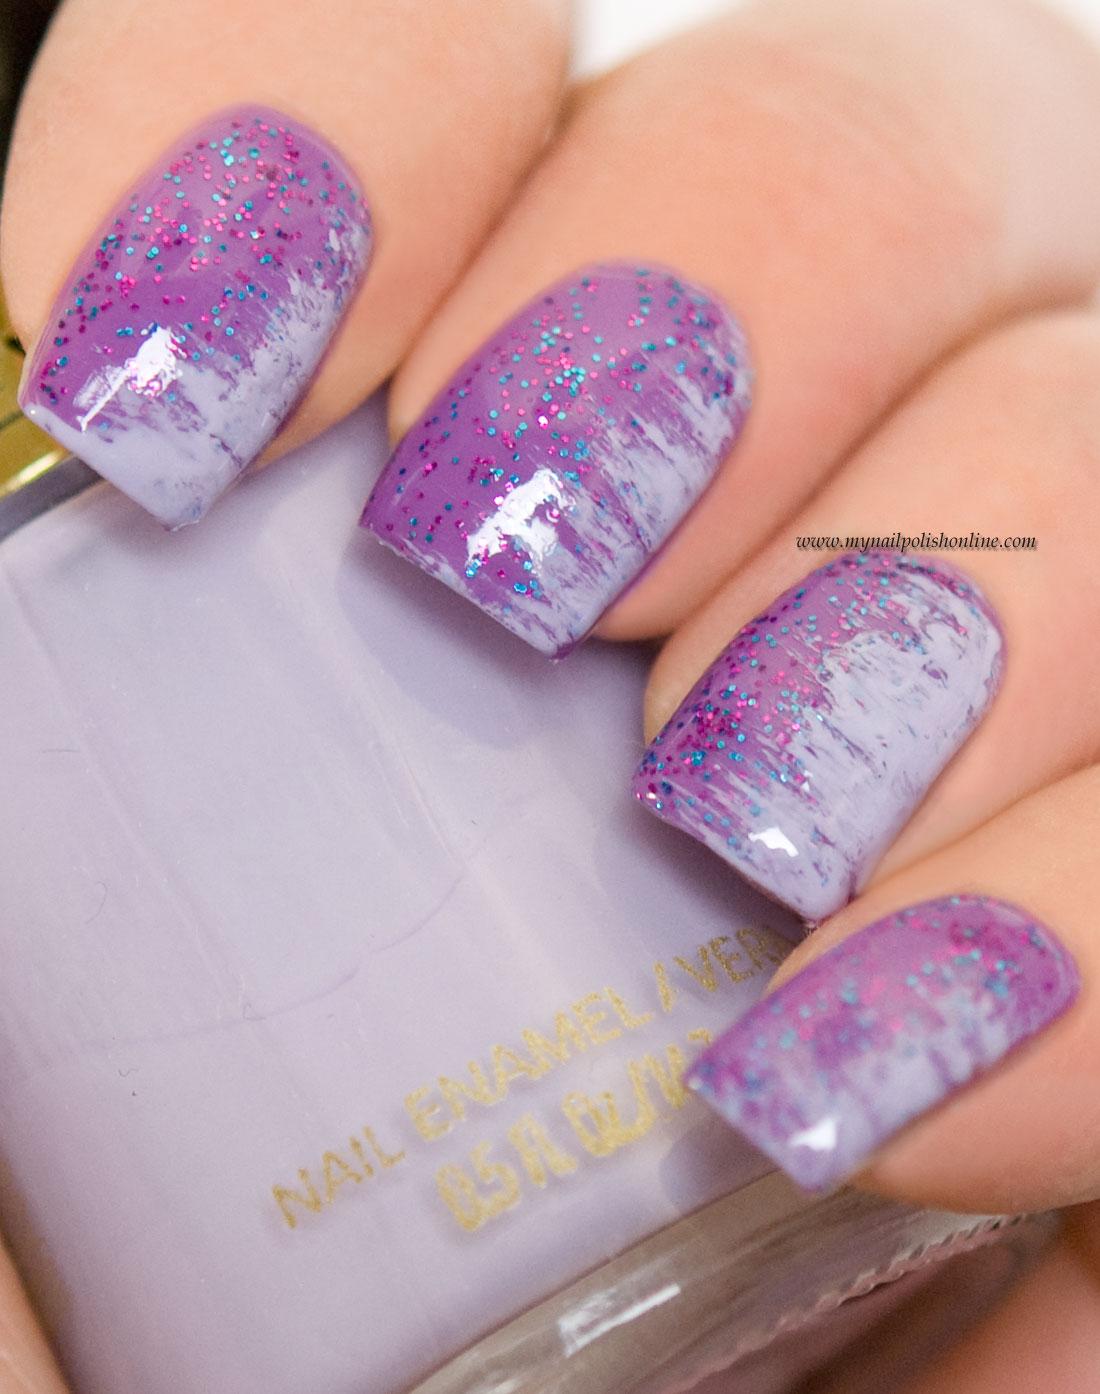 Nail Art - Fan brush on purple - My Nail Polish Online